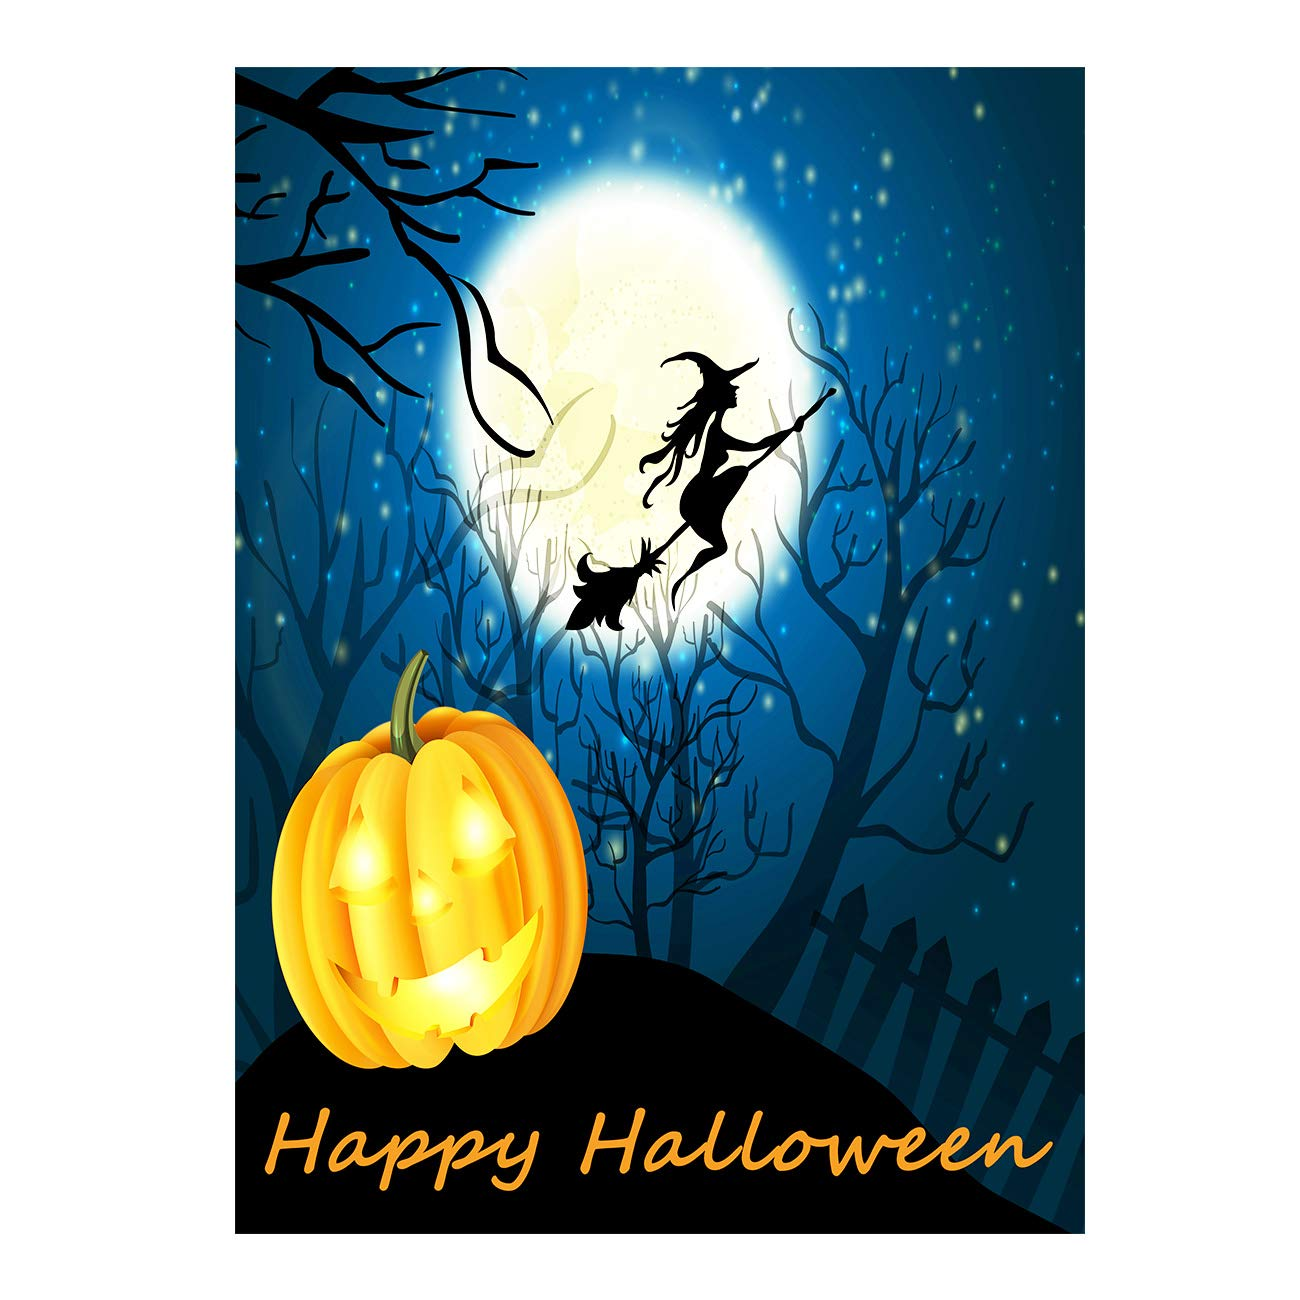 Happy Halloween Witch Pumpkin Jack o Lantern Castle Double Sided Garden Yard Flag 12'' x 18'', Winter Snow Moon Fall Festive Pumpkins Decorative Garden Flag Banner for Outdoor Home Decor Party